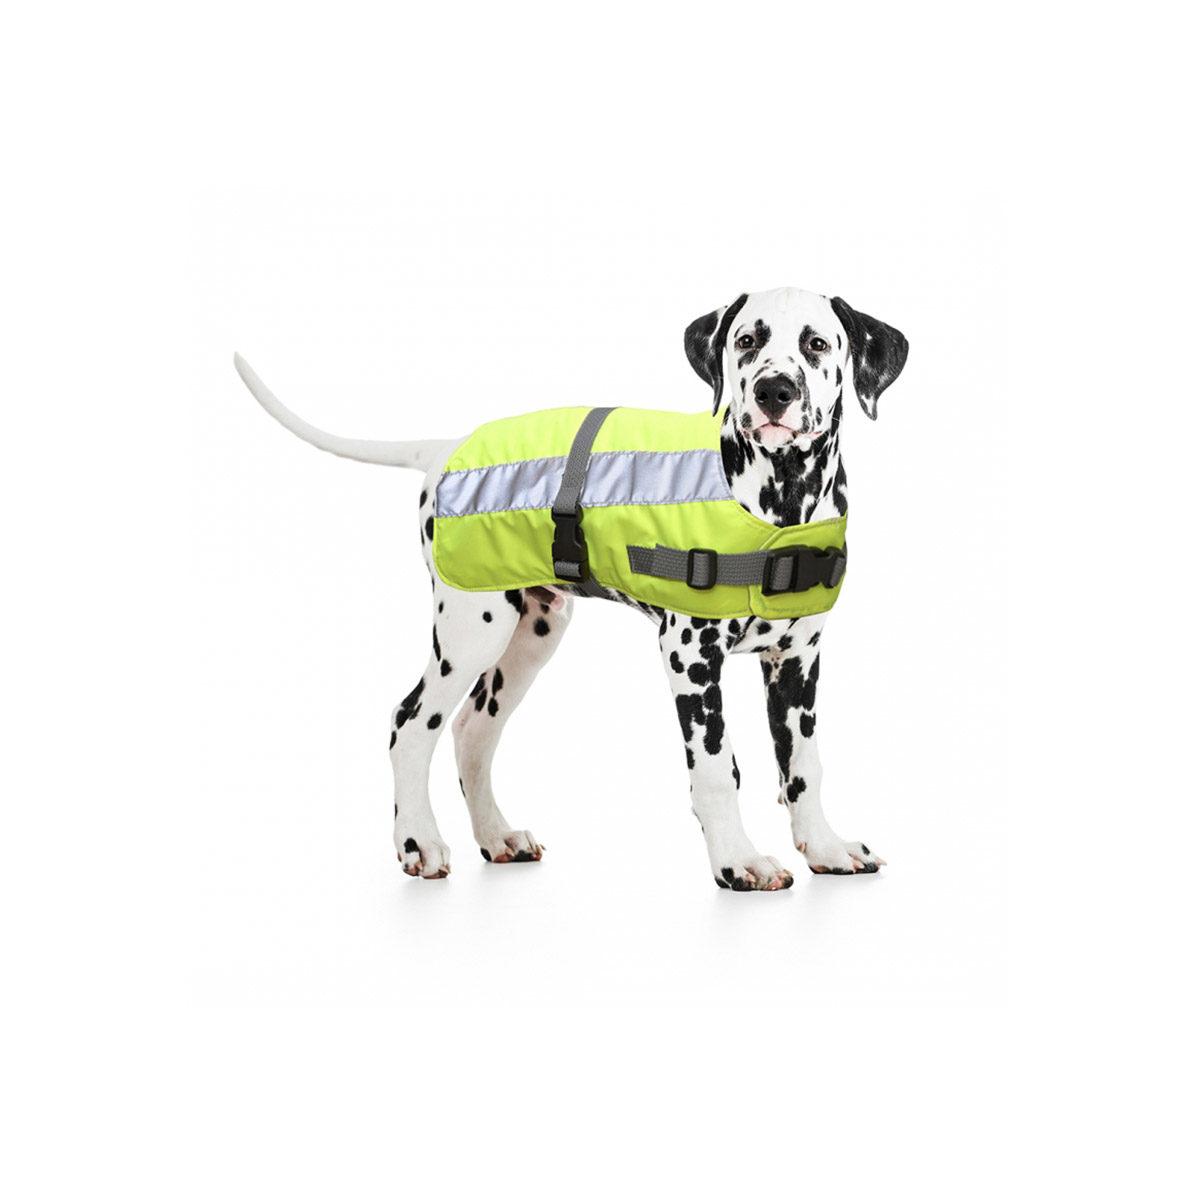 Duvo+ Flectalon Hi Vis Honden Jack Ruglengte 40 cm Geel - in Reflectie & Verlichting